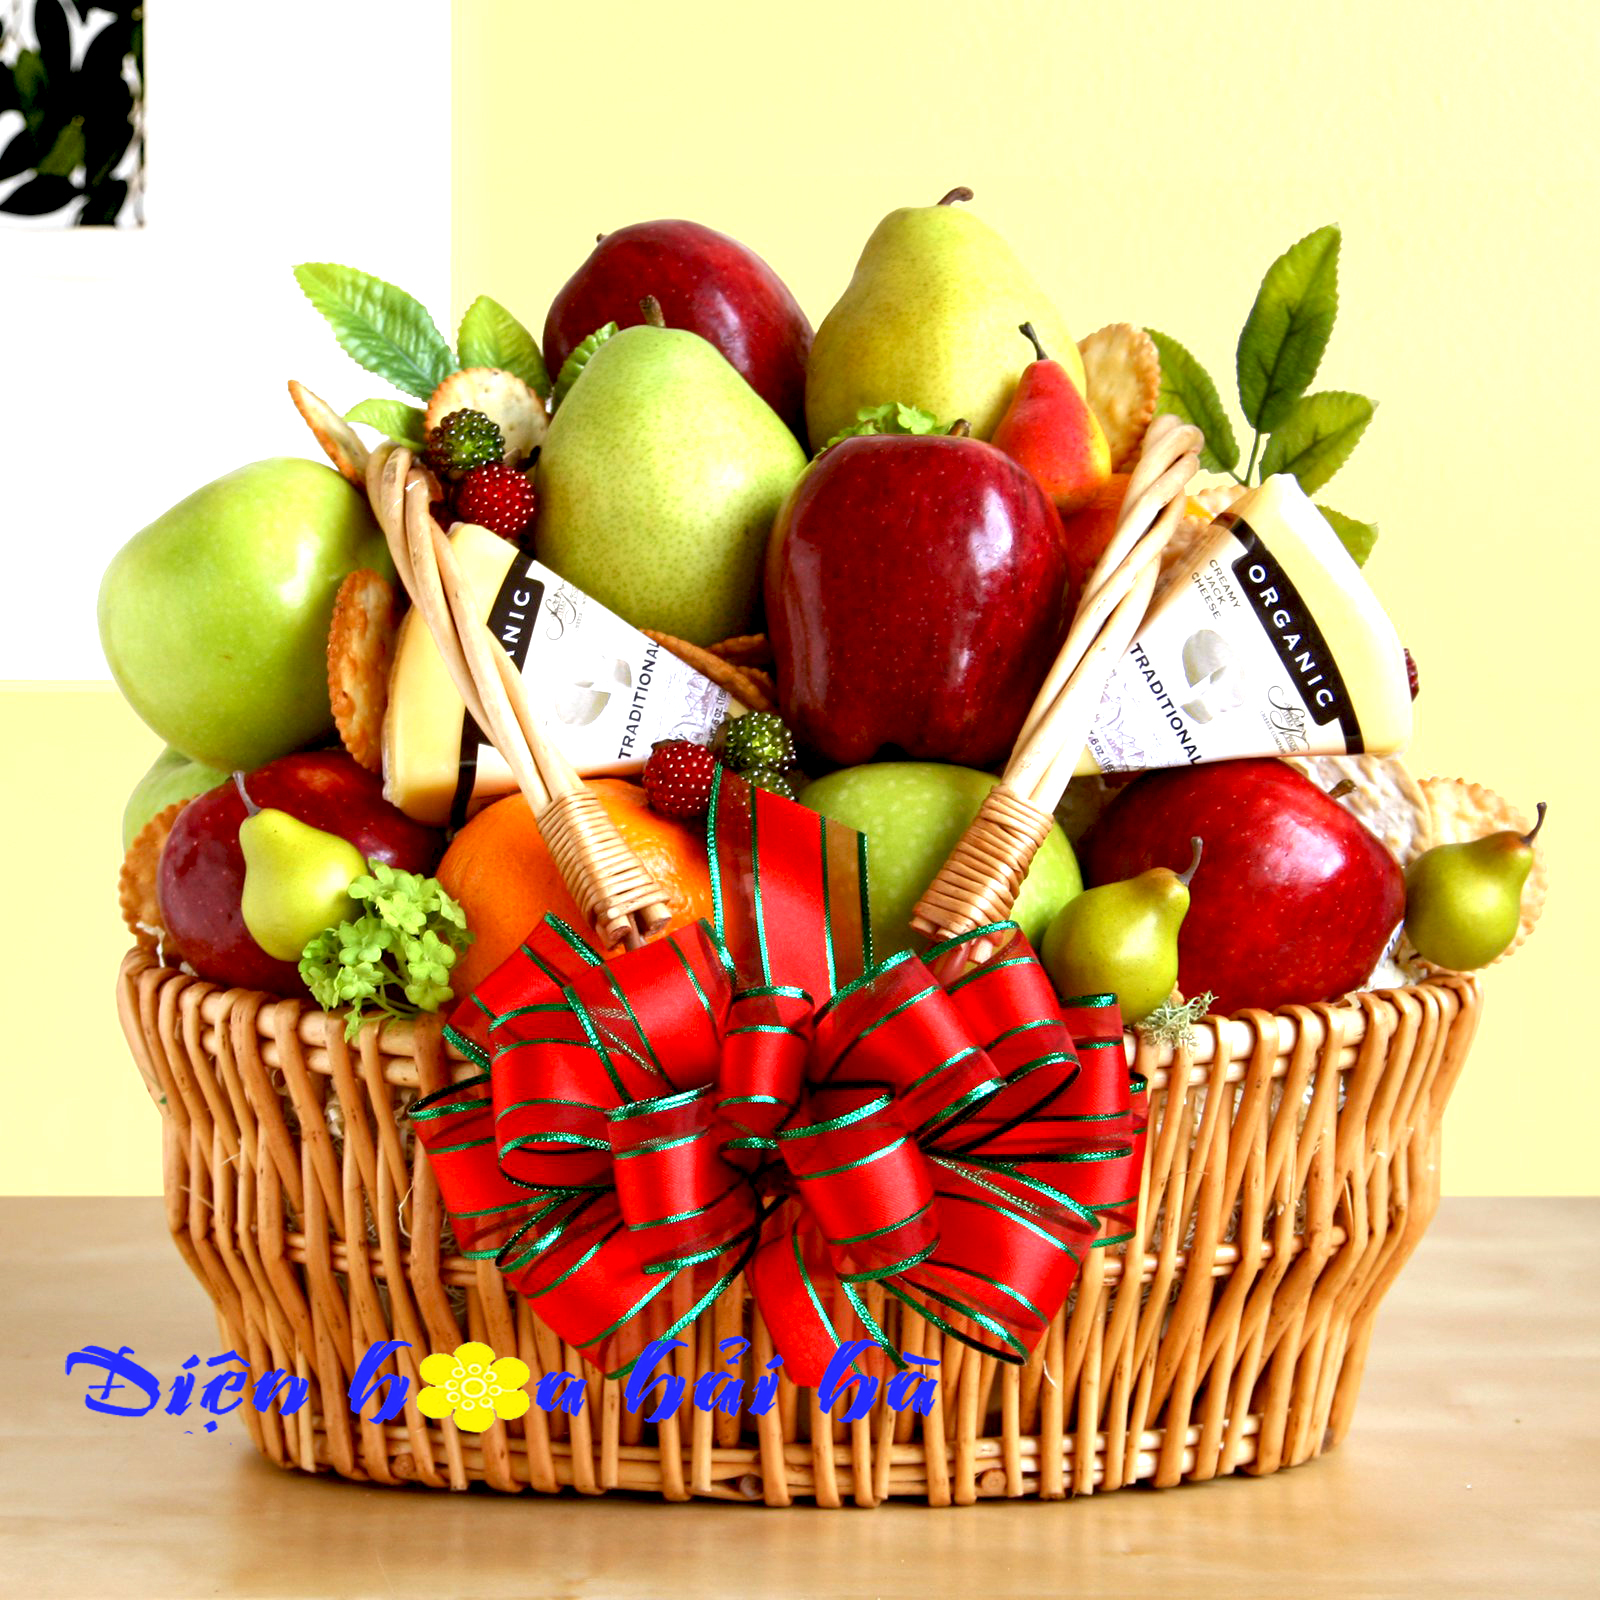 Mẫu giỏ hoa quả 32